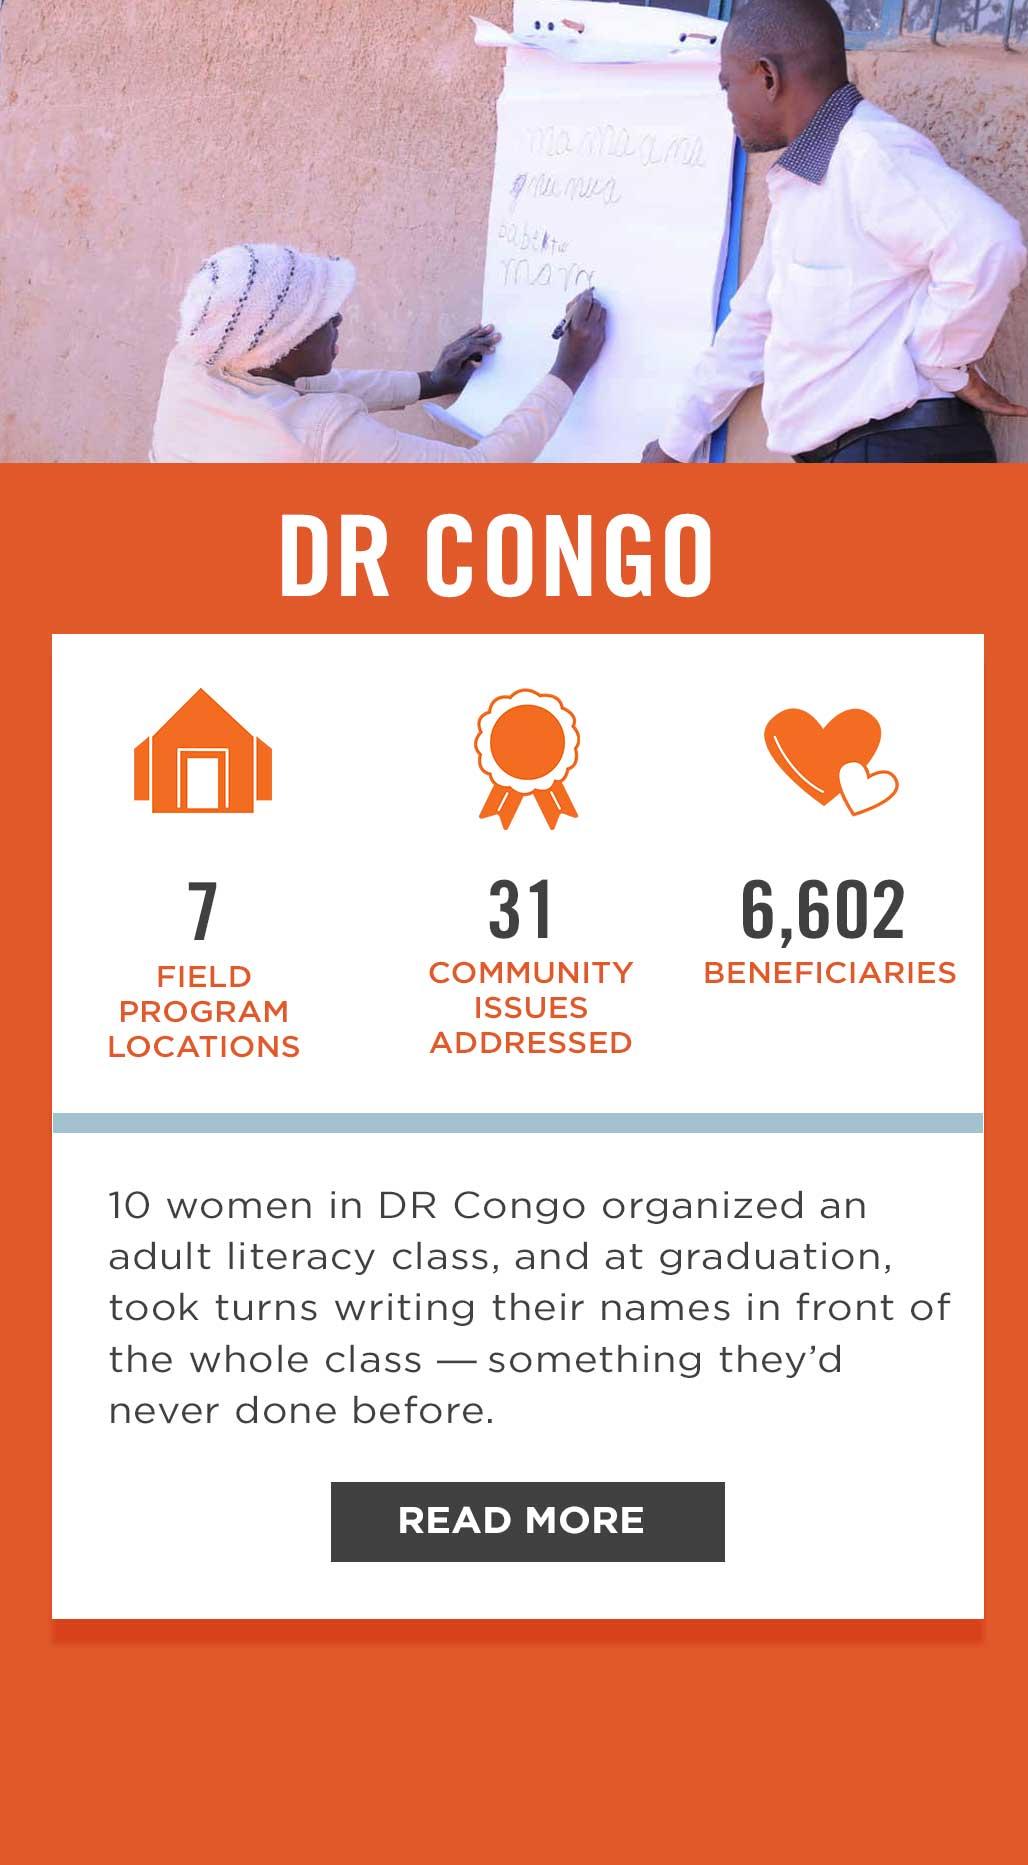 DR Congo Field Program